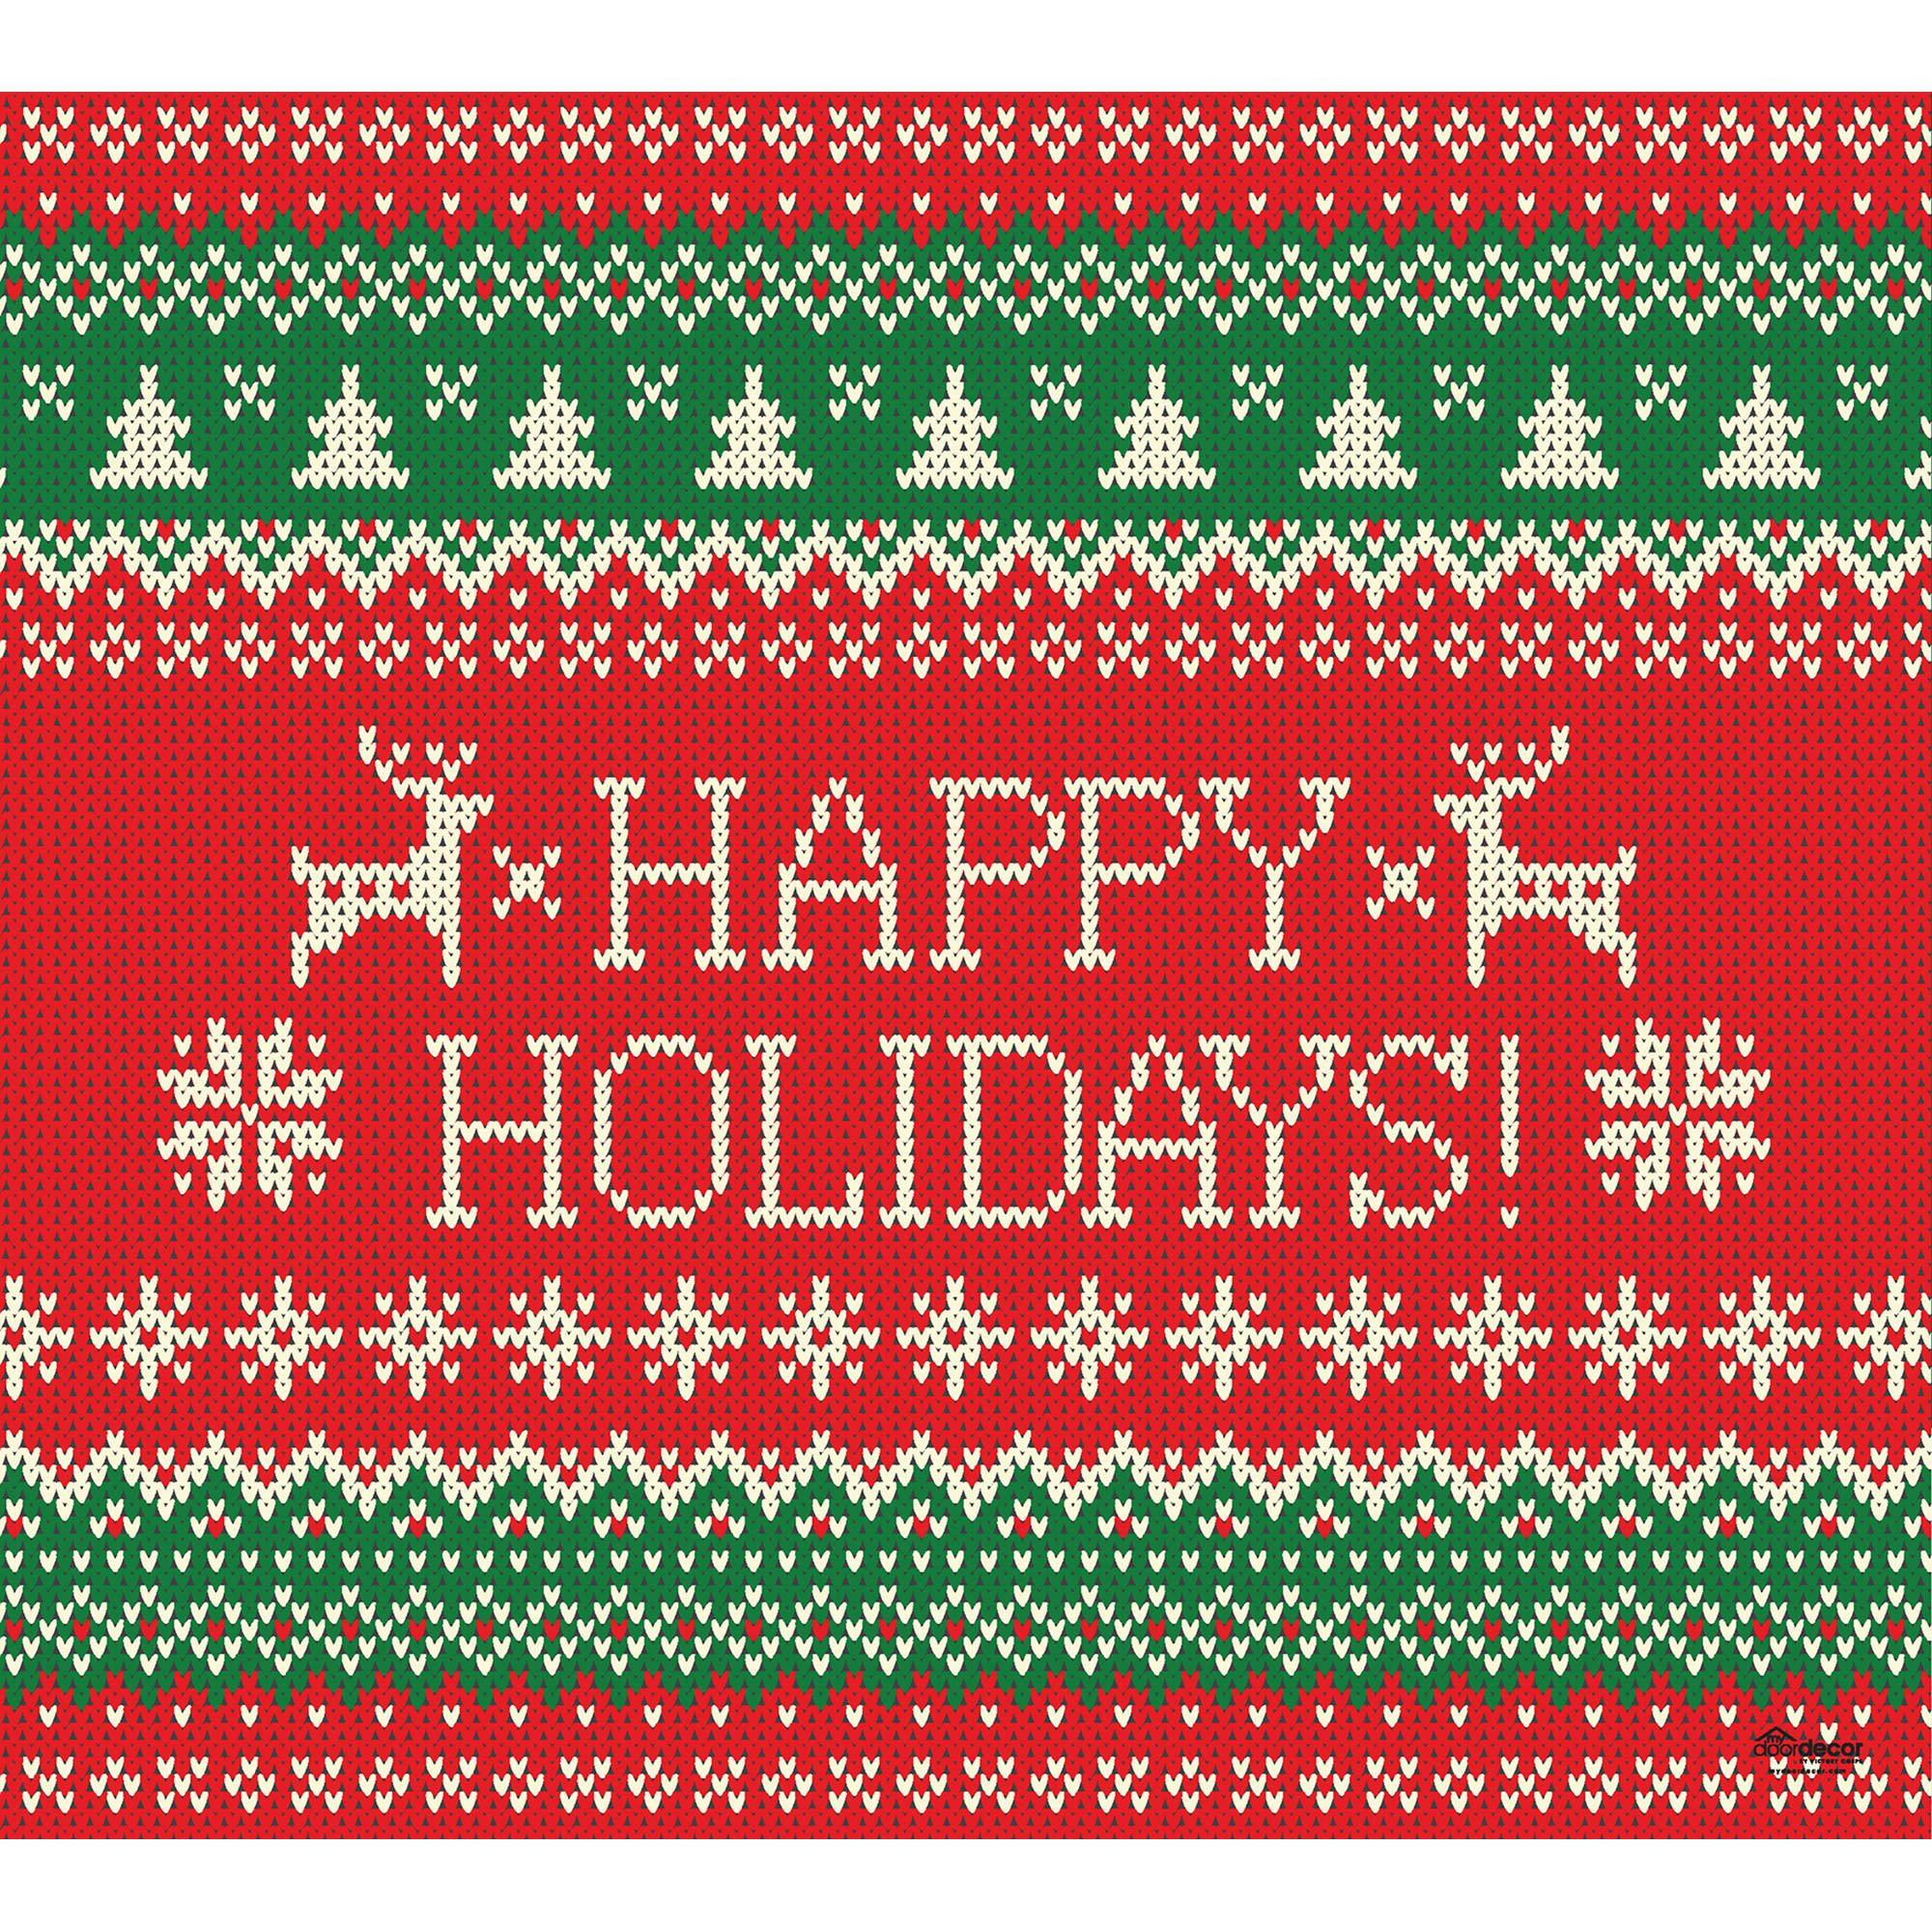 Ugly Sweater: Happy Holidays - Garage Door Vinyl Banner | Shop Fathead® for Christmas Gifts #halloweendoordecor